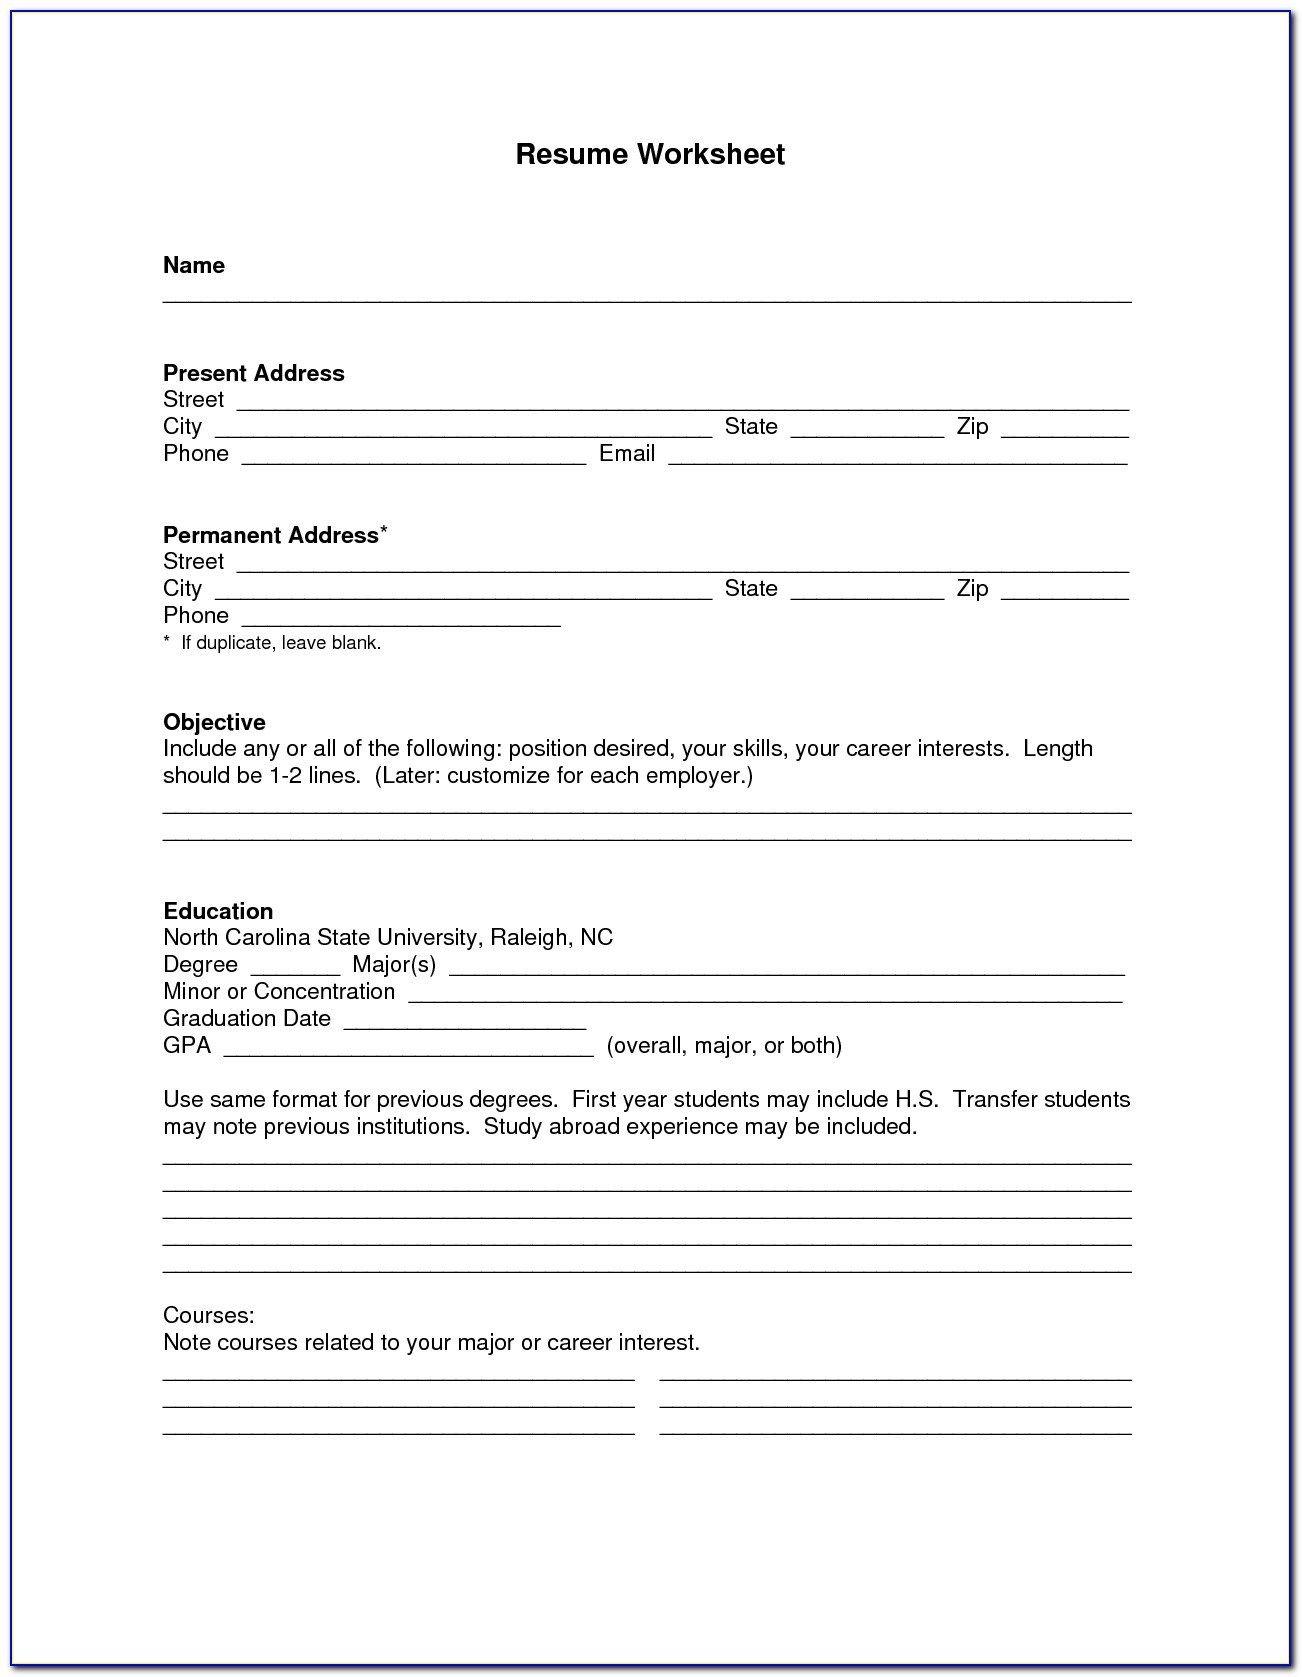 Blank Resume Form For Job Application in 2020 Resume